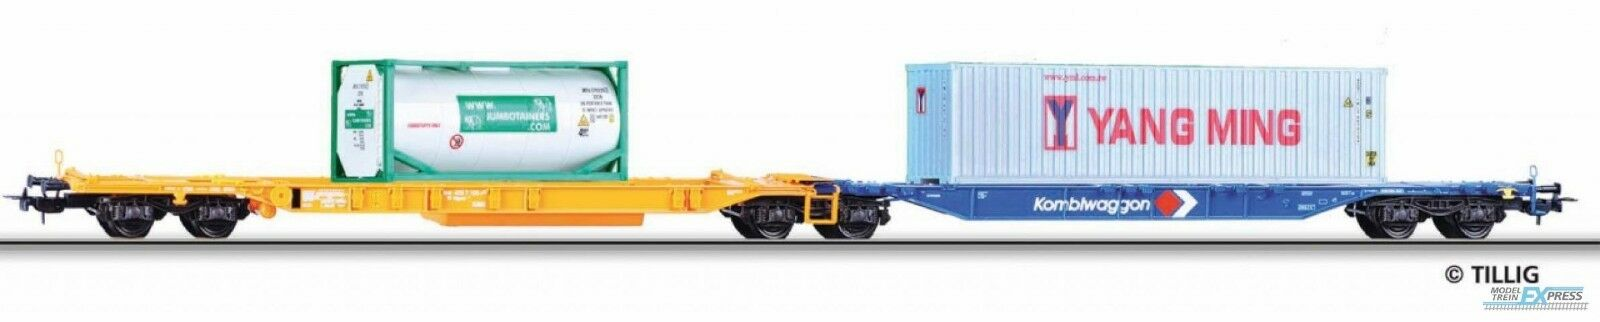 TILLIG 76670 DB Kombiwaggon Sdggmrs 744 arancio/blu, 1 tankcontainer 20' + 1 con